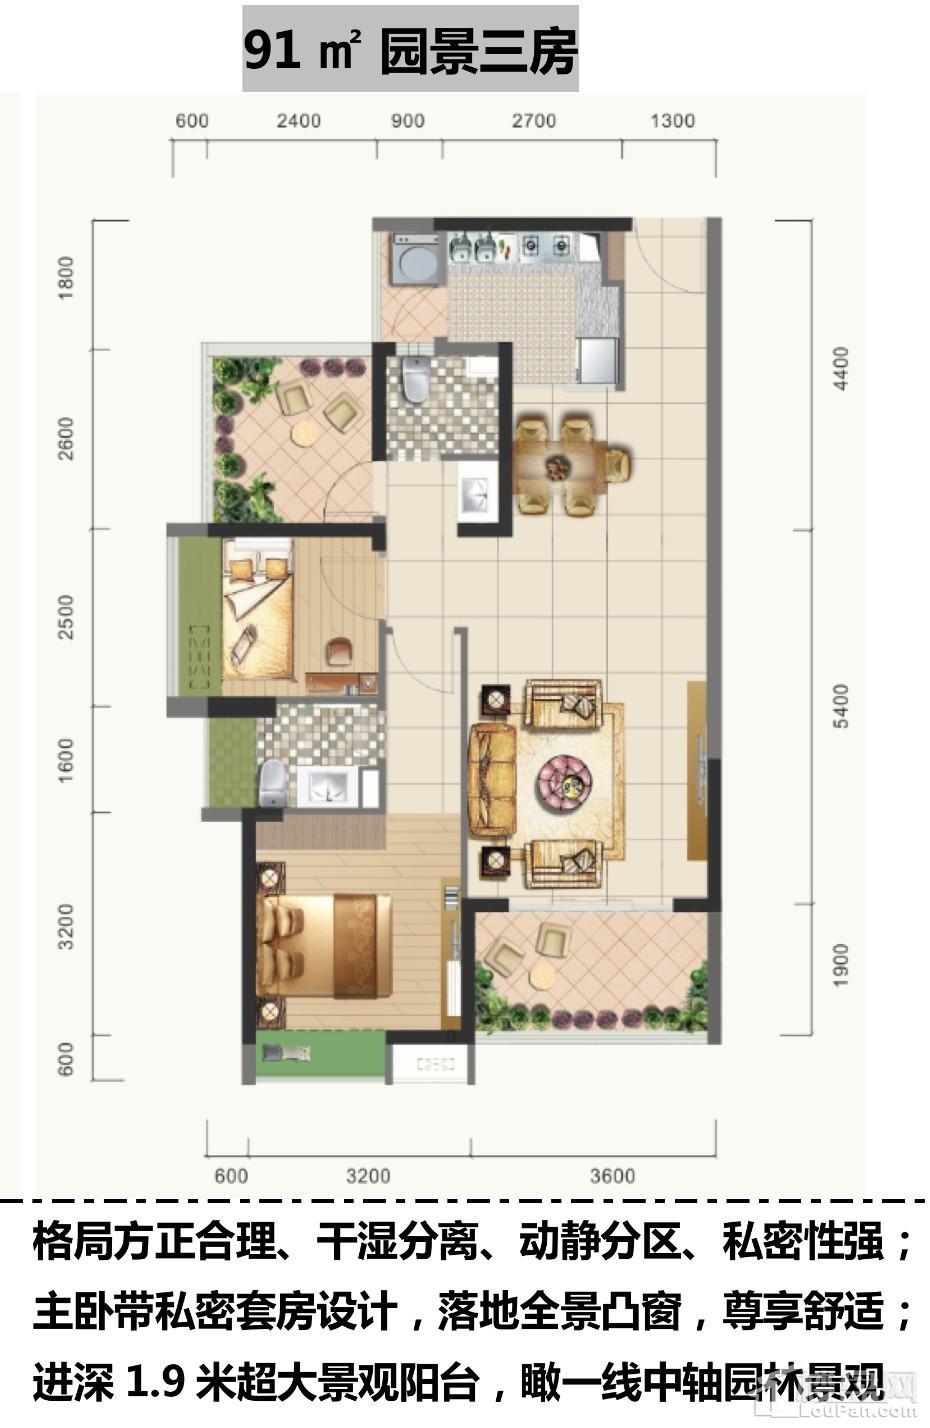 91m²园景三房